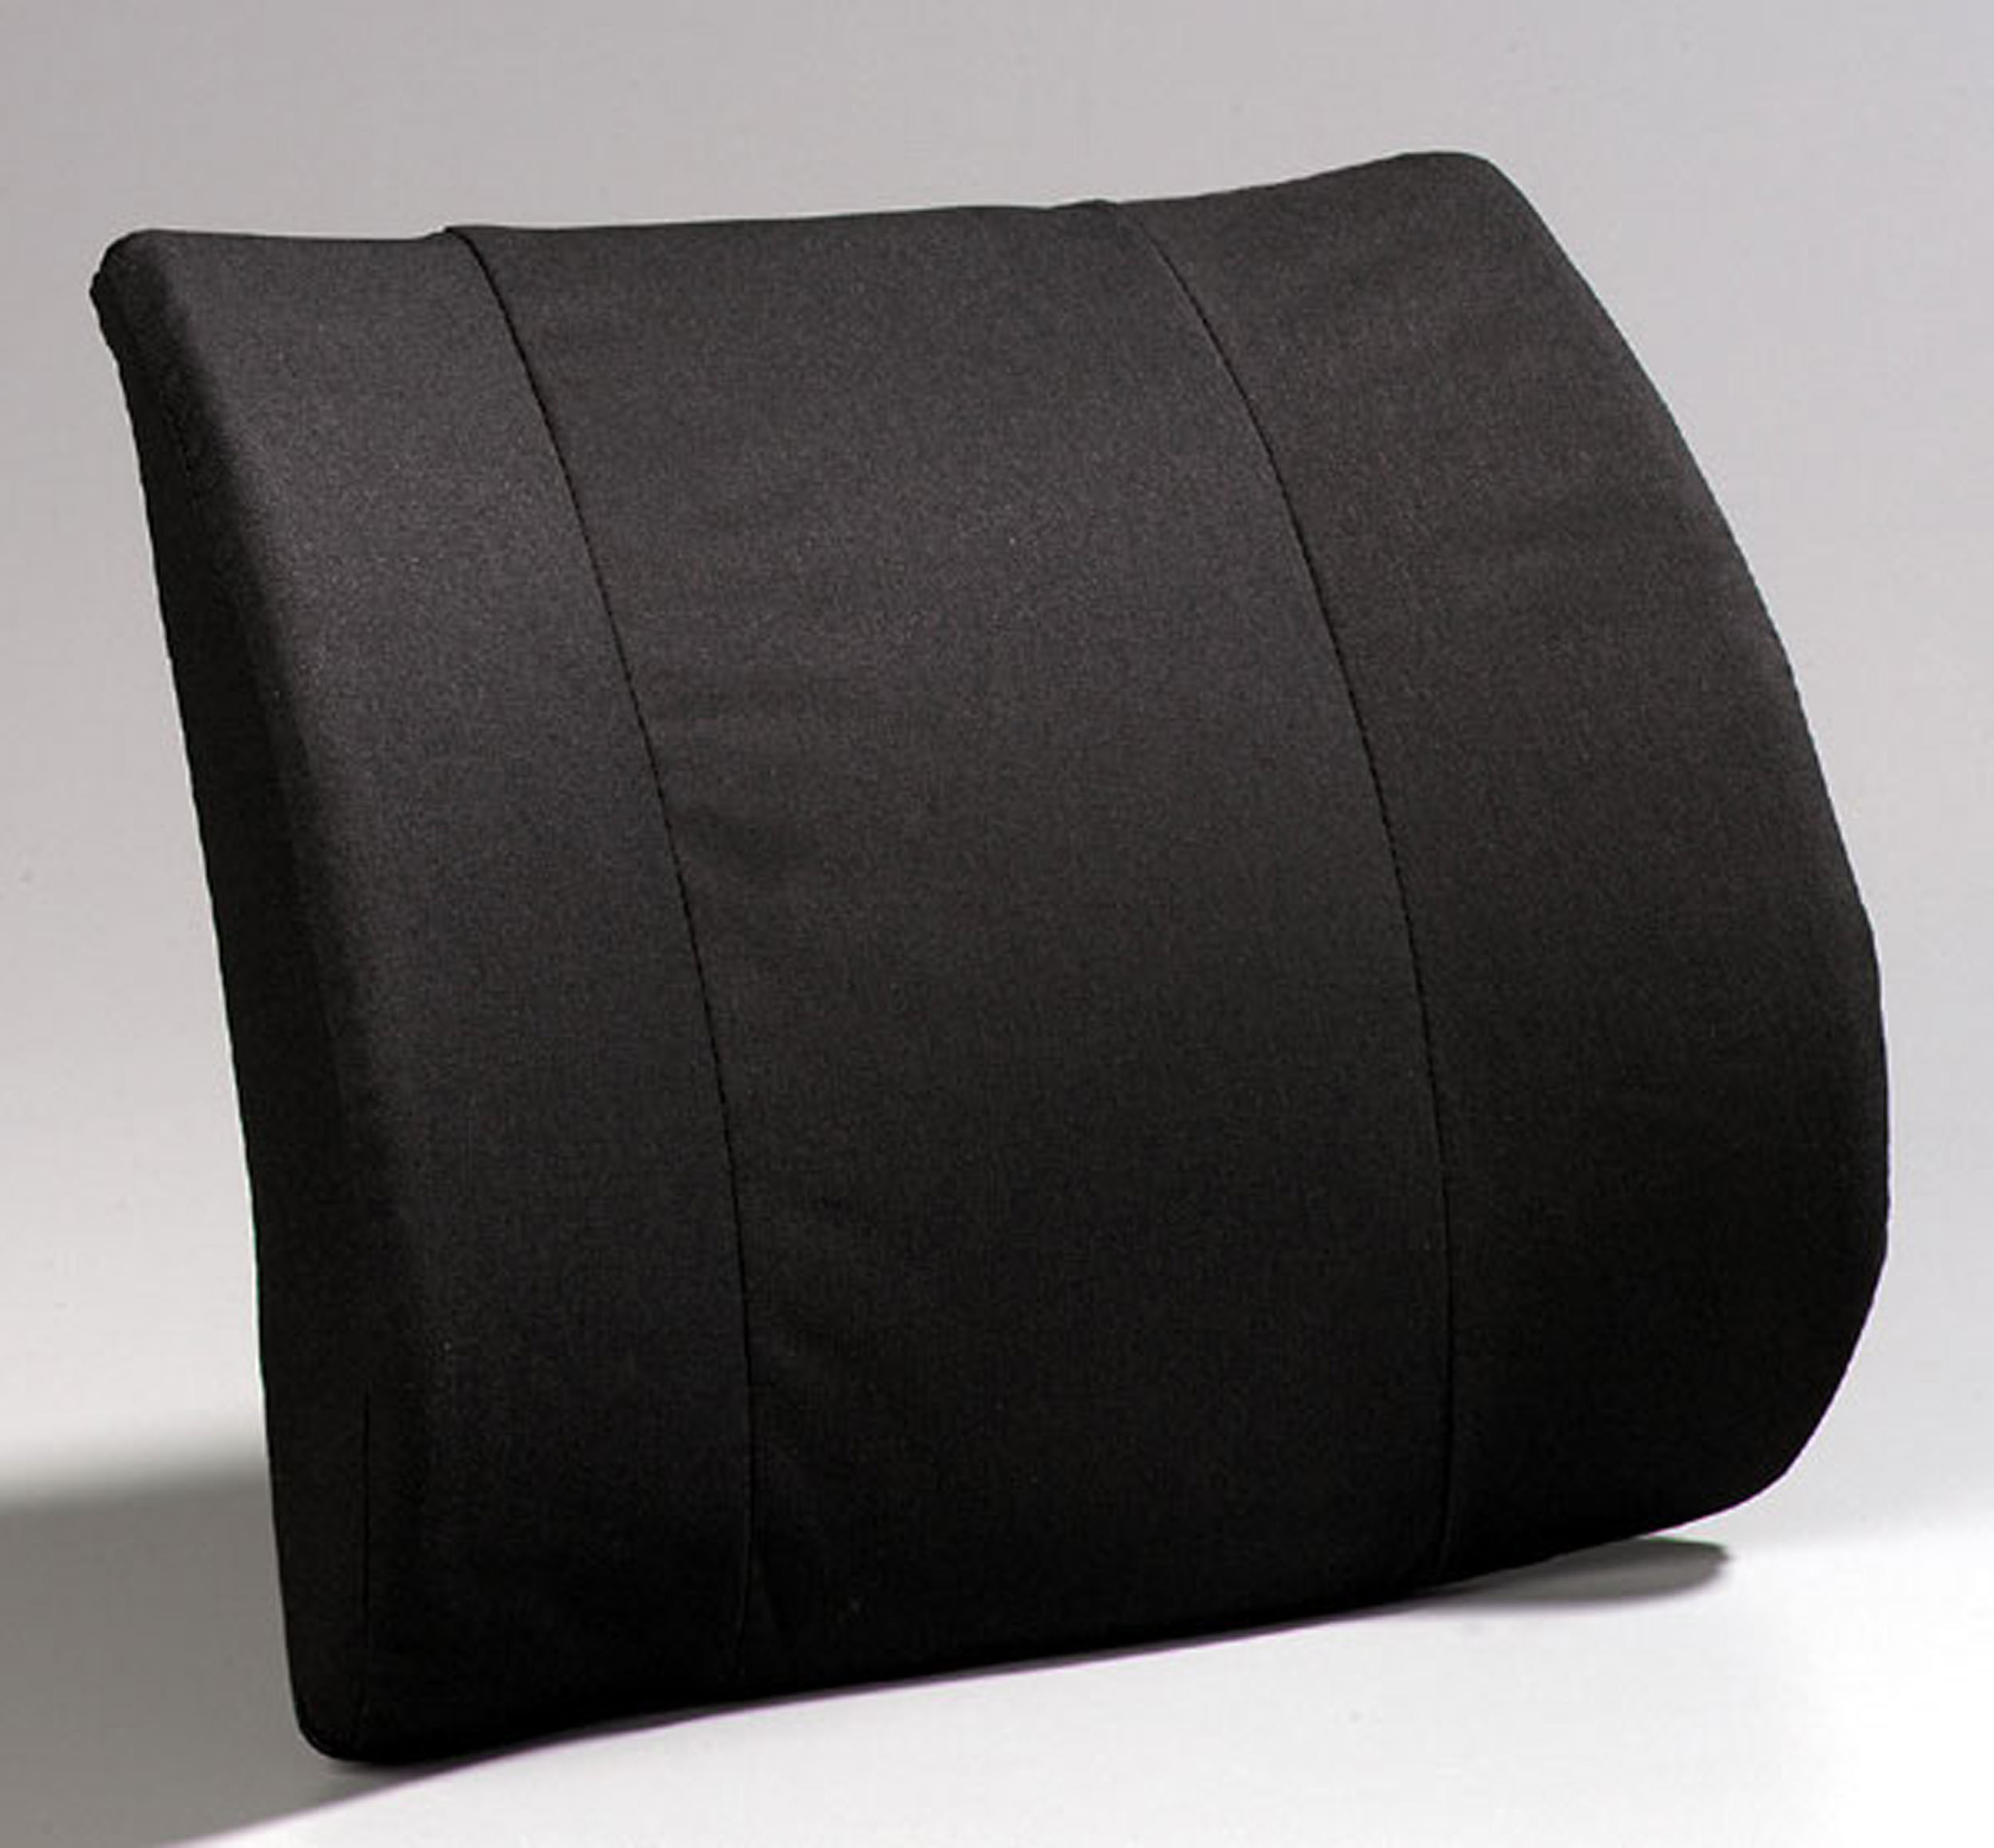 ergonomic chair back support cushion directors covers habitat bb6005 betterback premium molded lumbar jobri